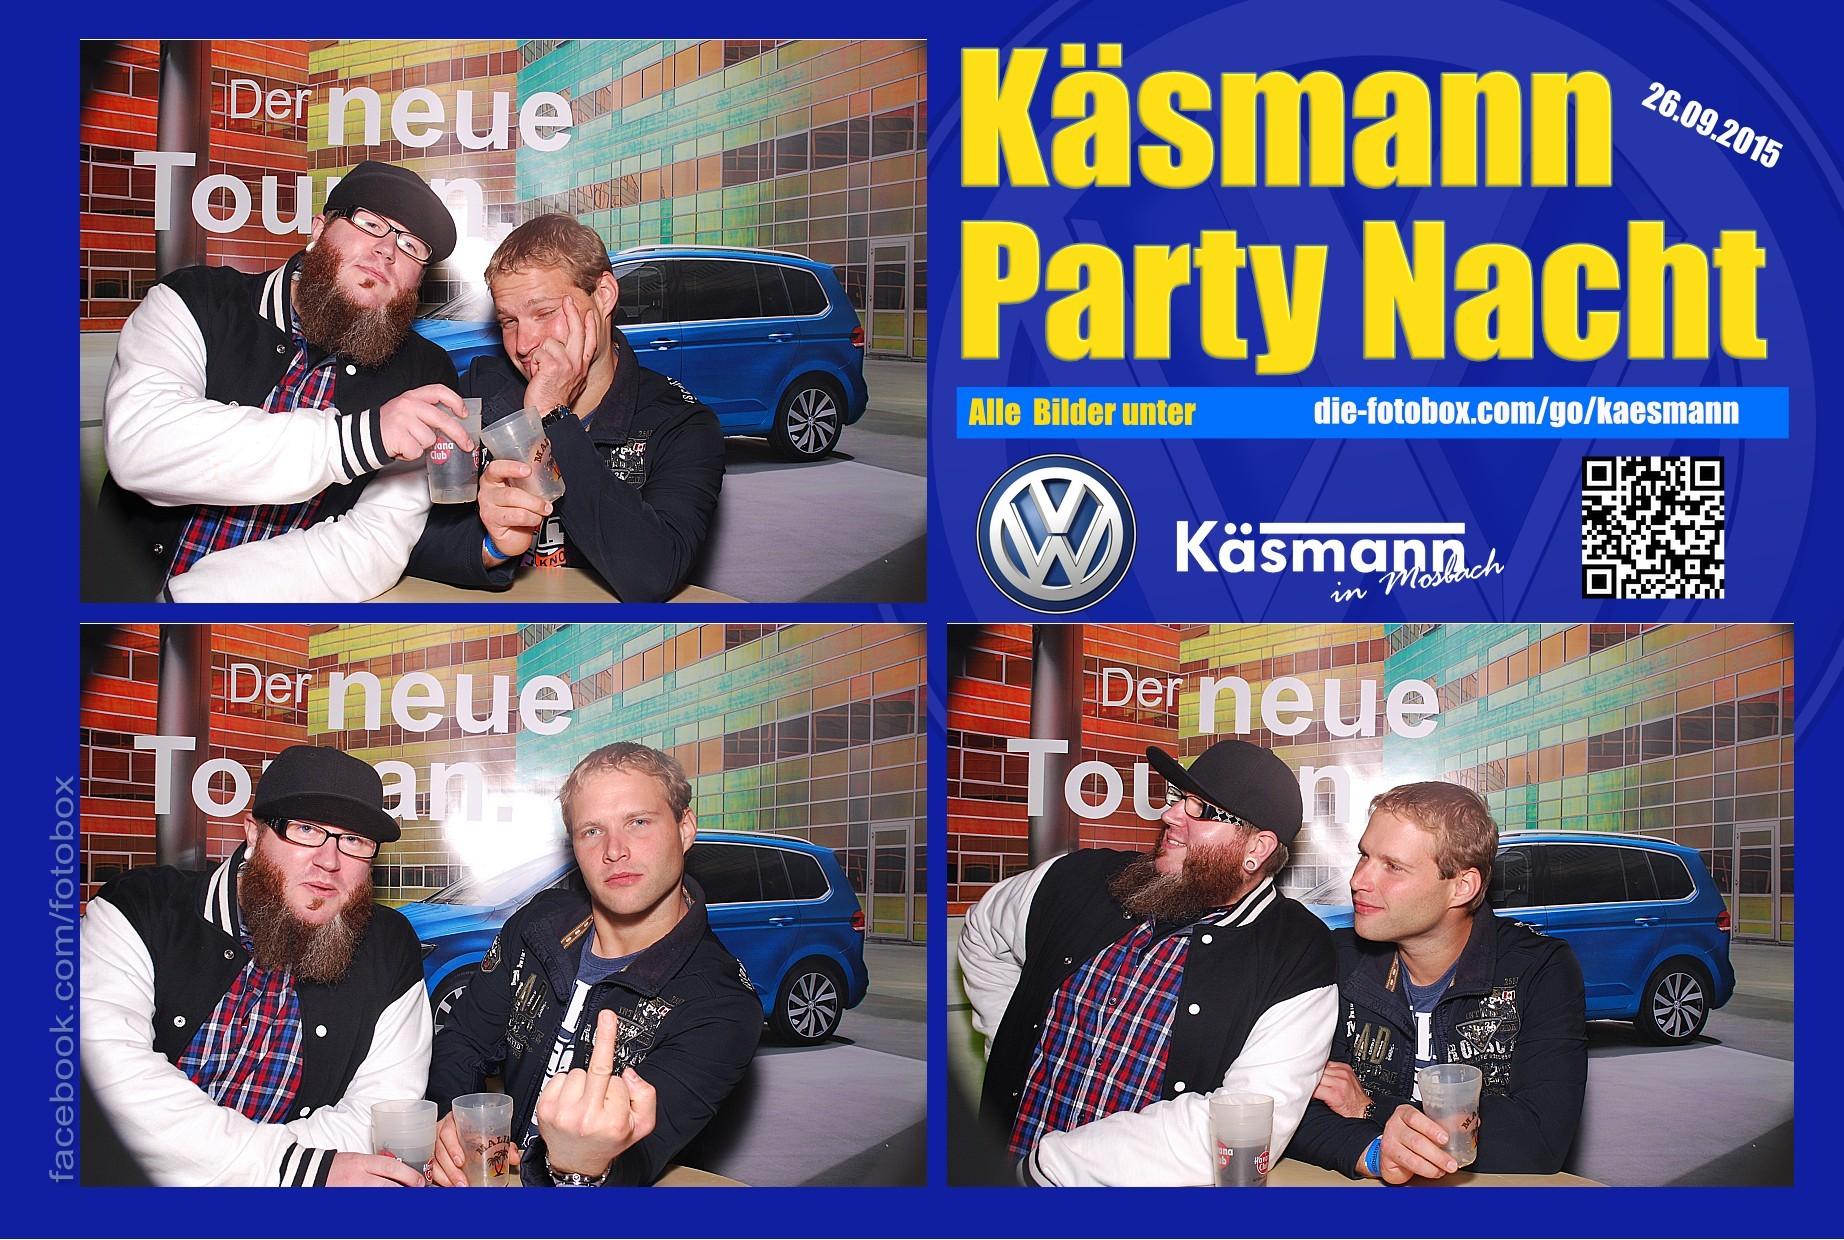 Käsmannparty 2015 - www.die-fotobox.com 01252